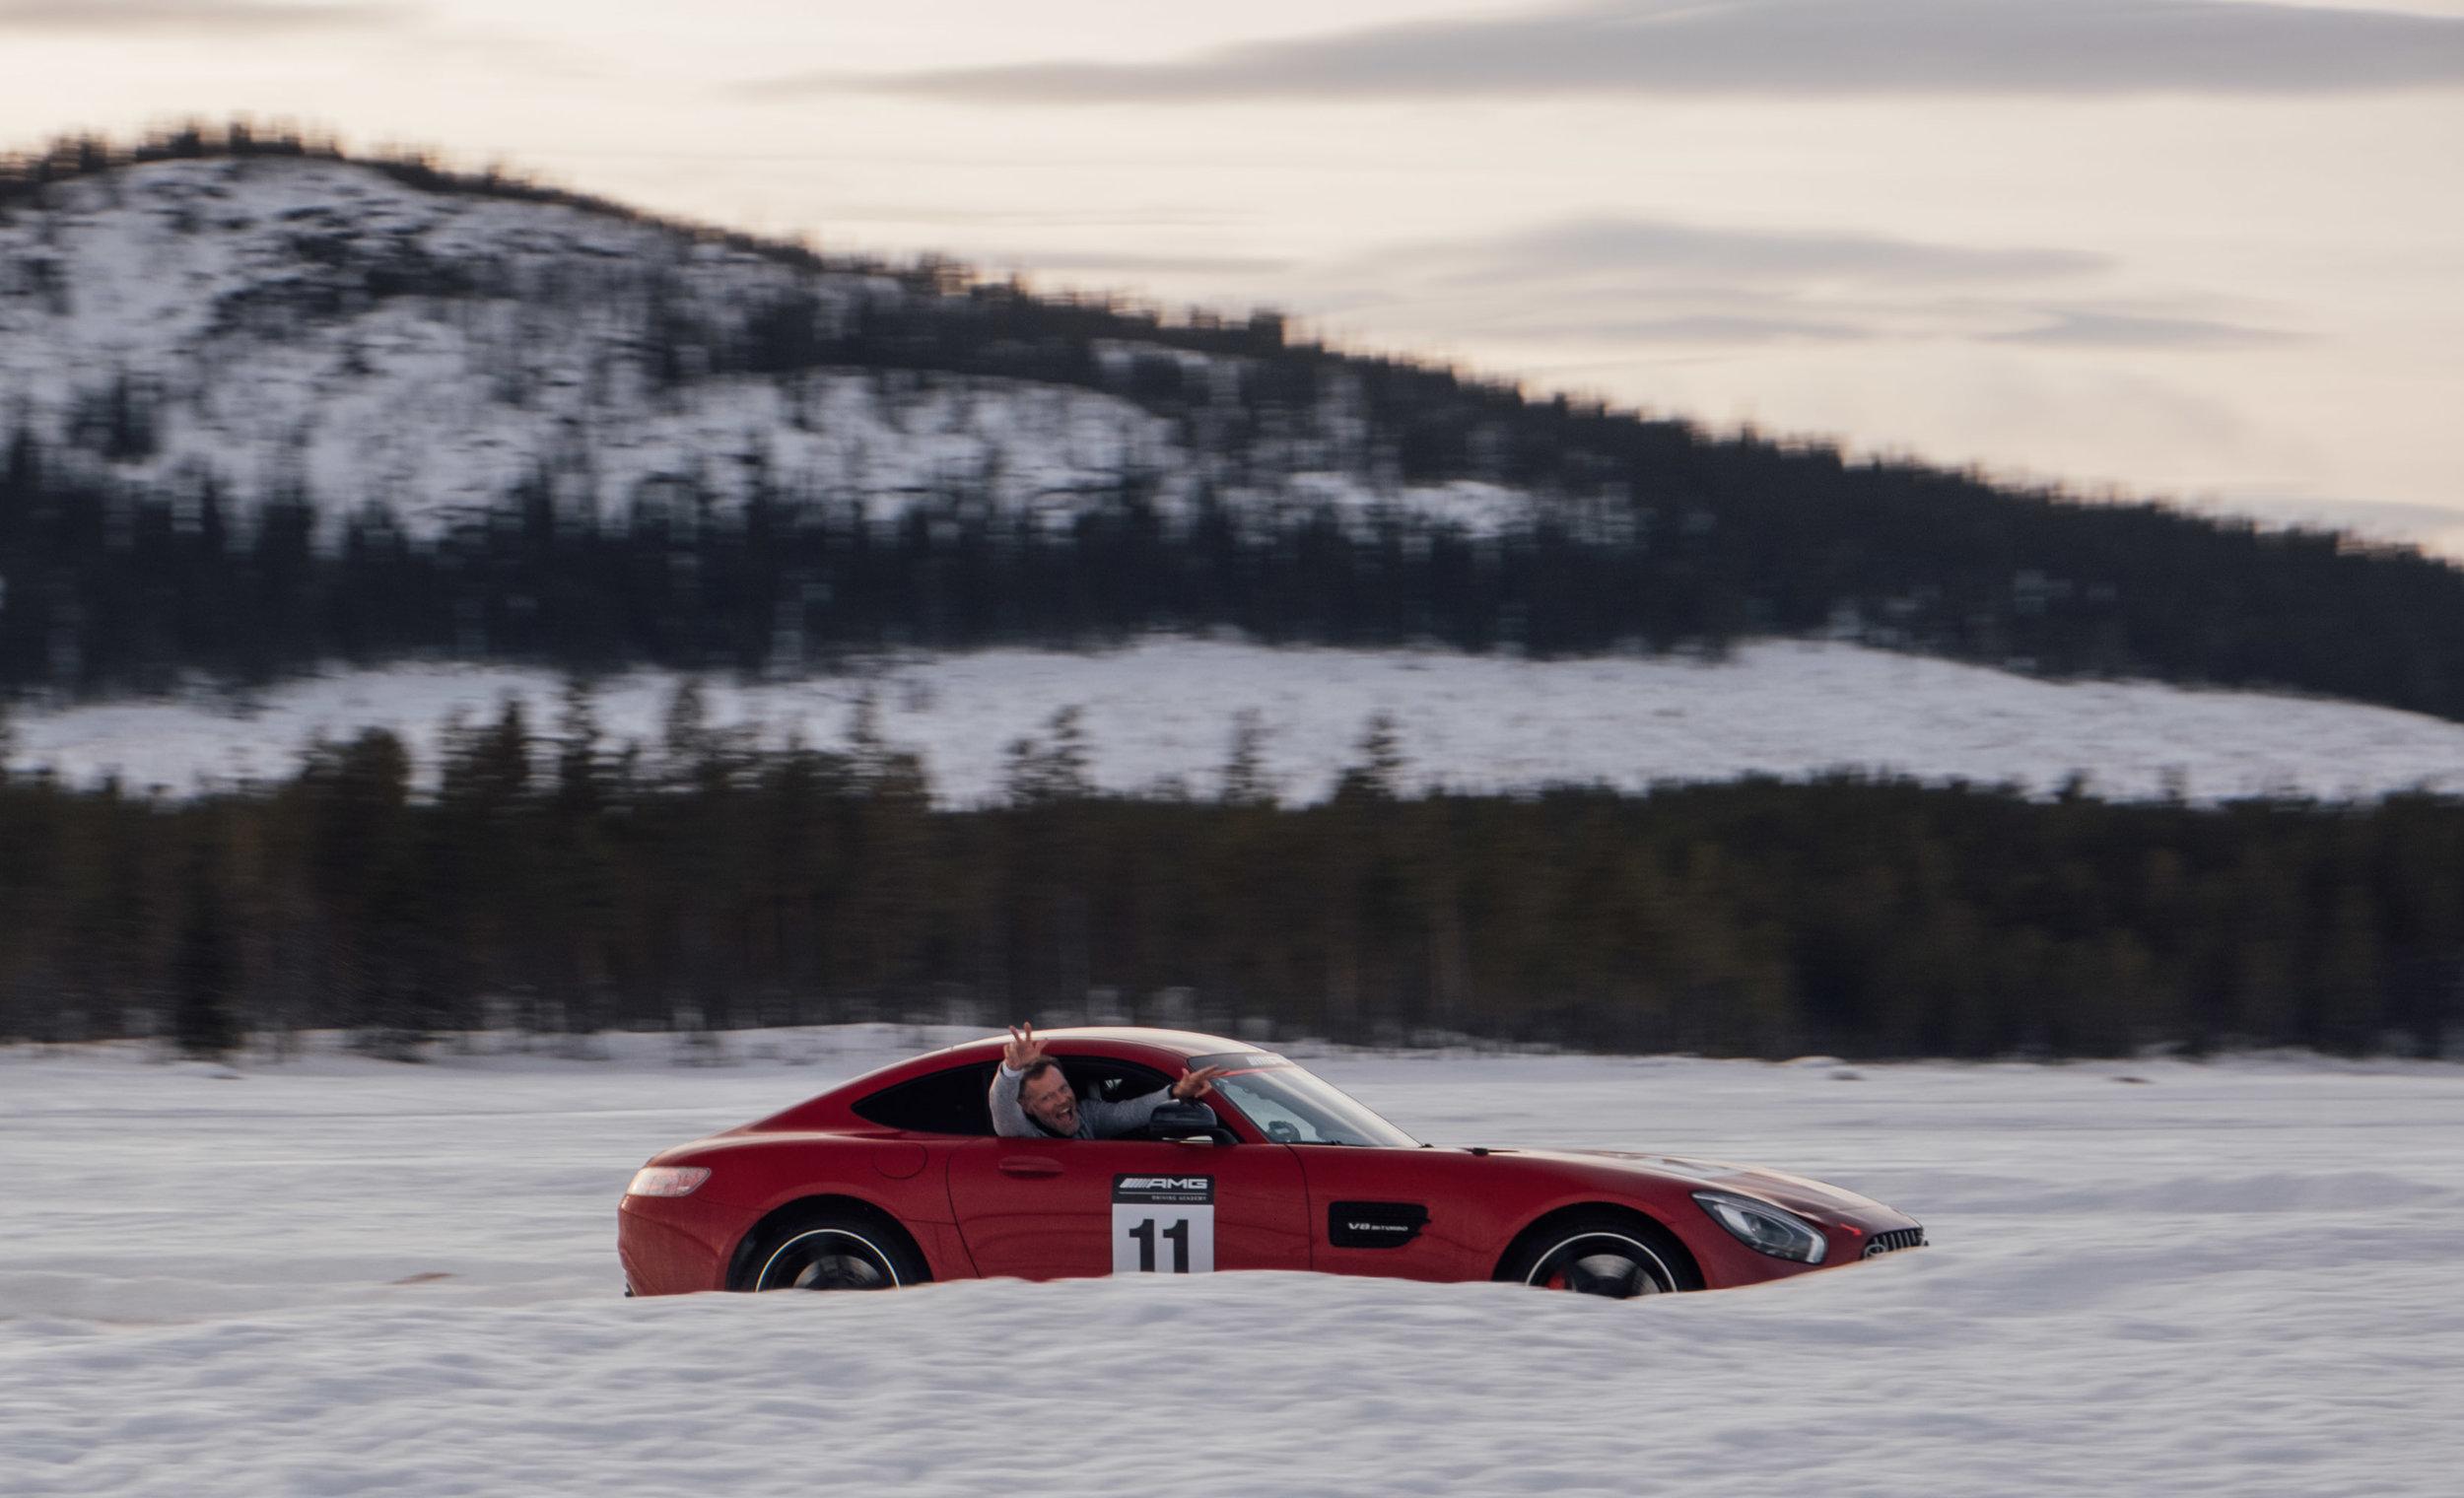 Drive_for_Good_Ice_Drive_by_Maxim_Kuijper-0050.jpg